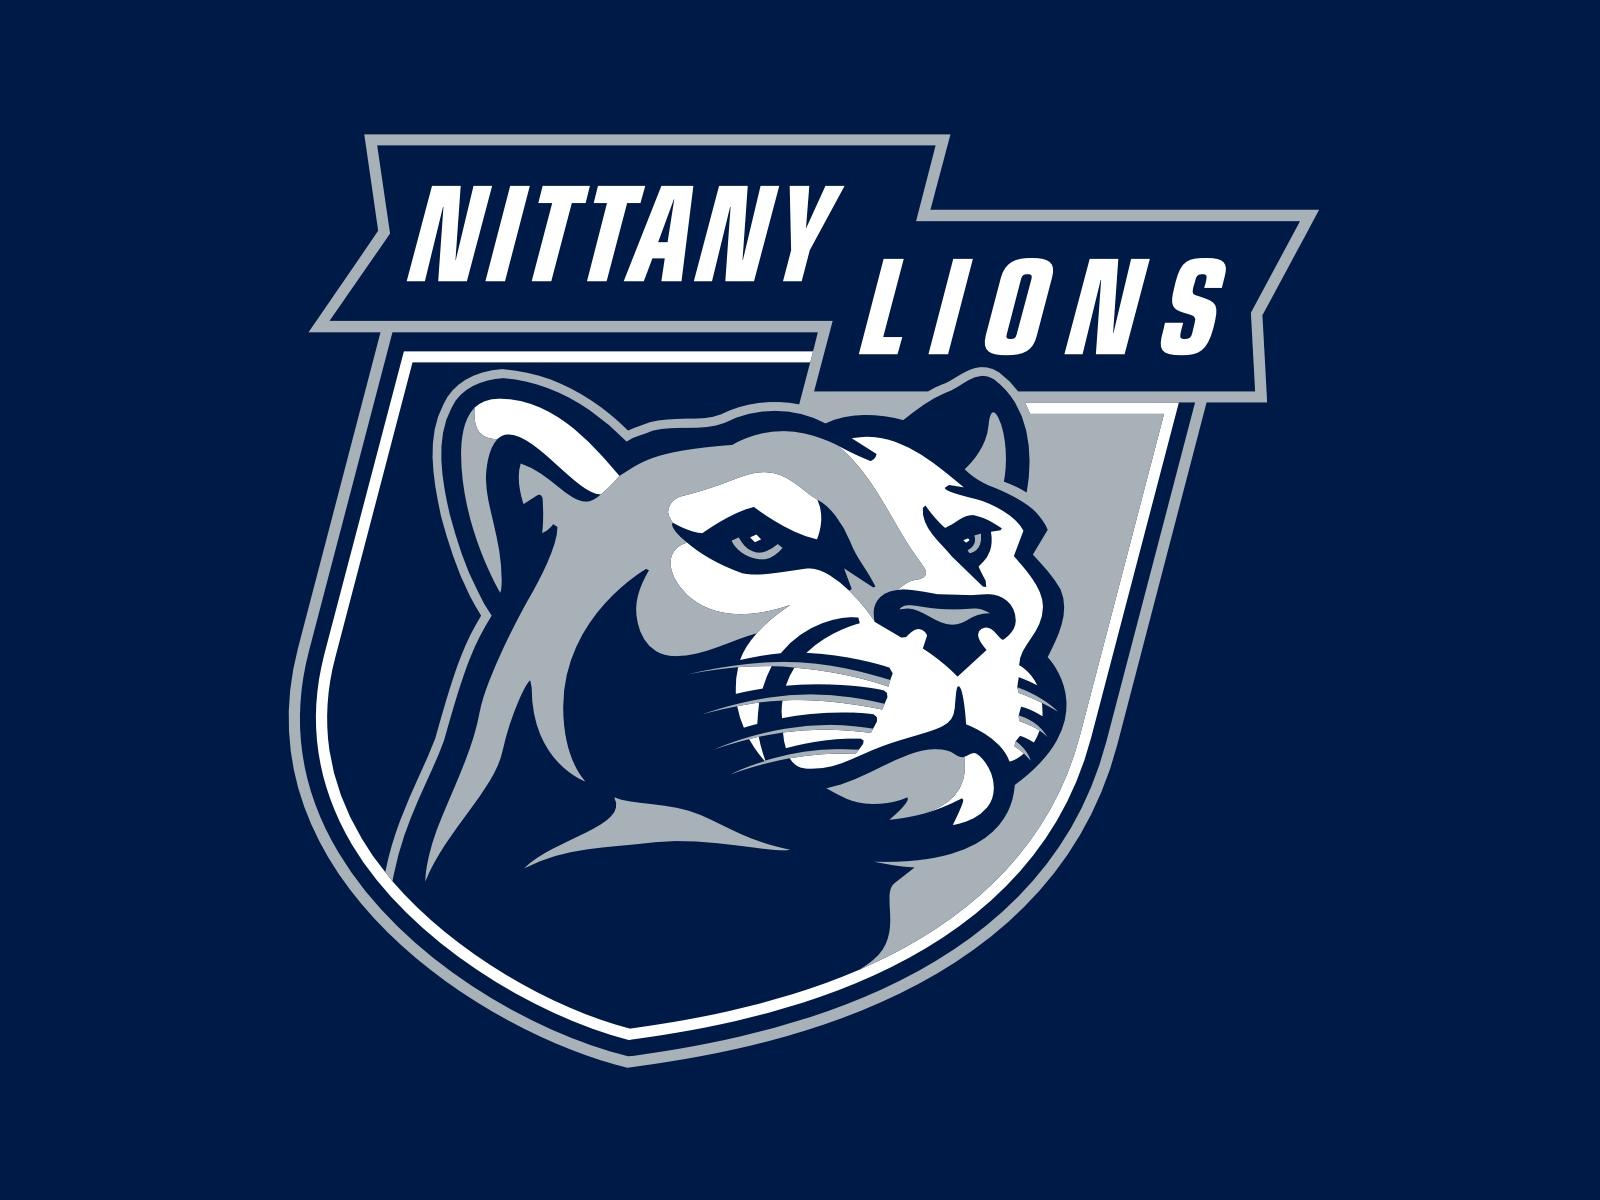 University PSU College Football Nittany Lions Logo 1600x1200 DESKTOP 1600x1200